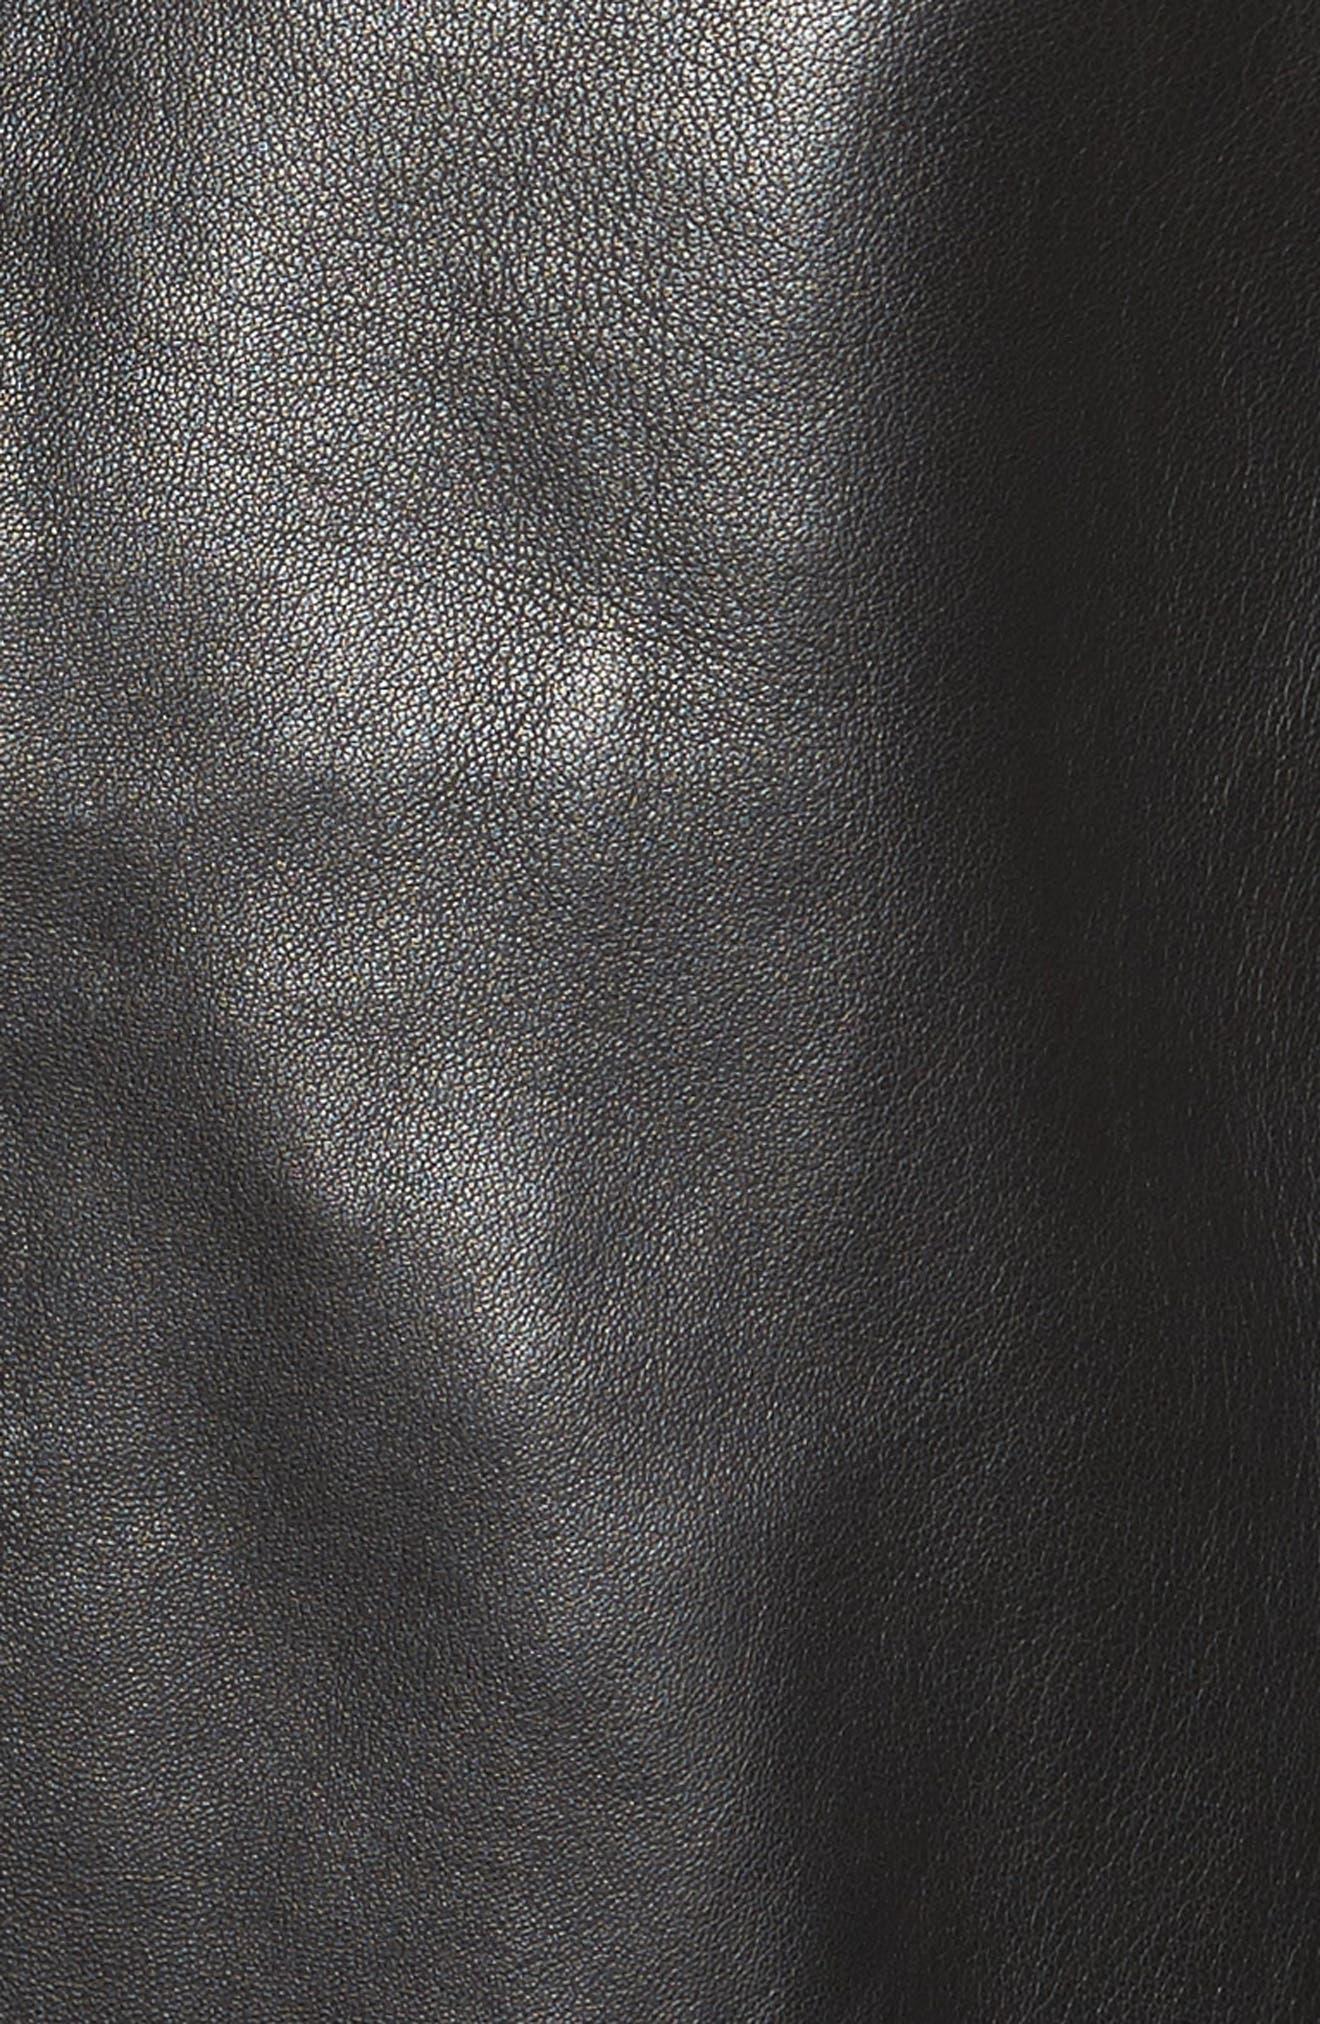 Bonded Leather Moto Jacket,                             Alternate thumbnail 6, color,                             BLACK